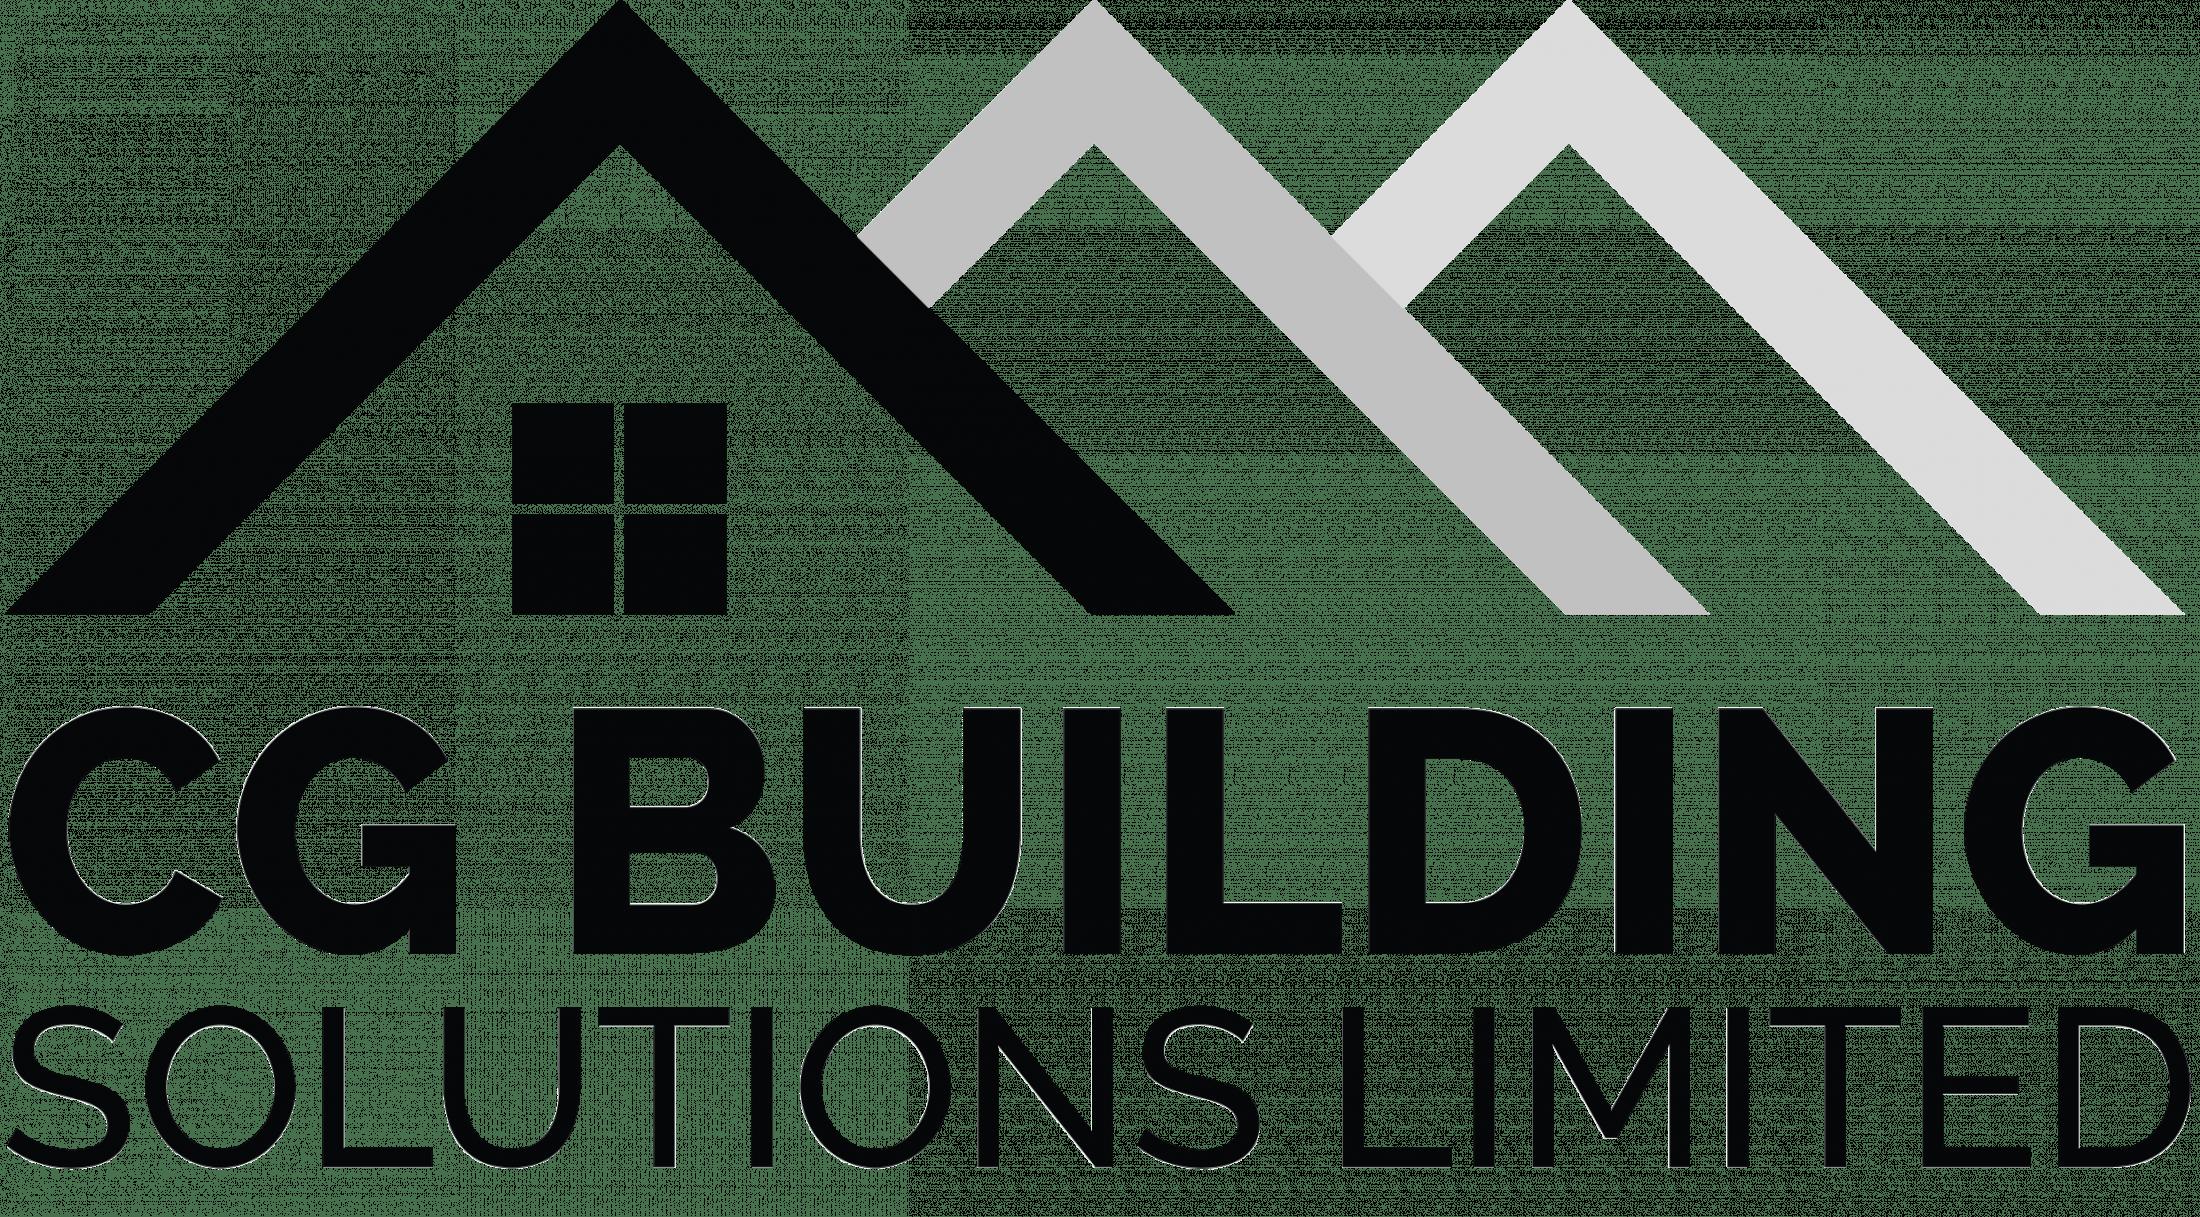 CG BUILDING